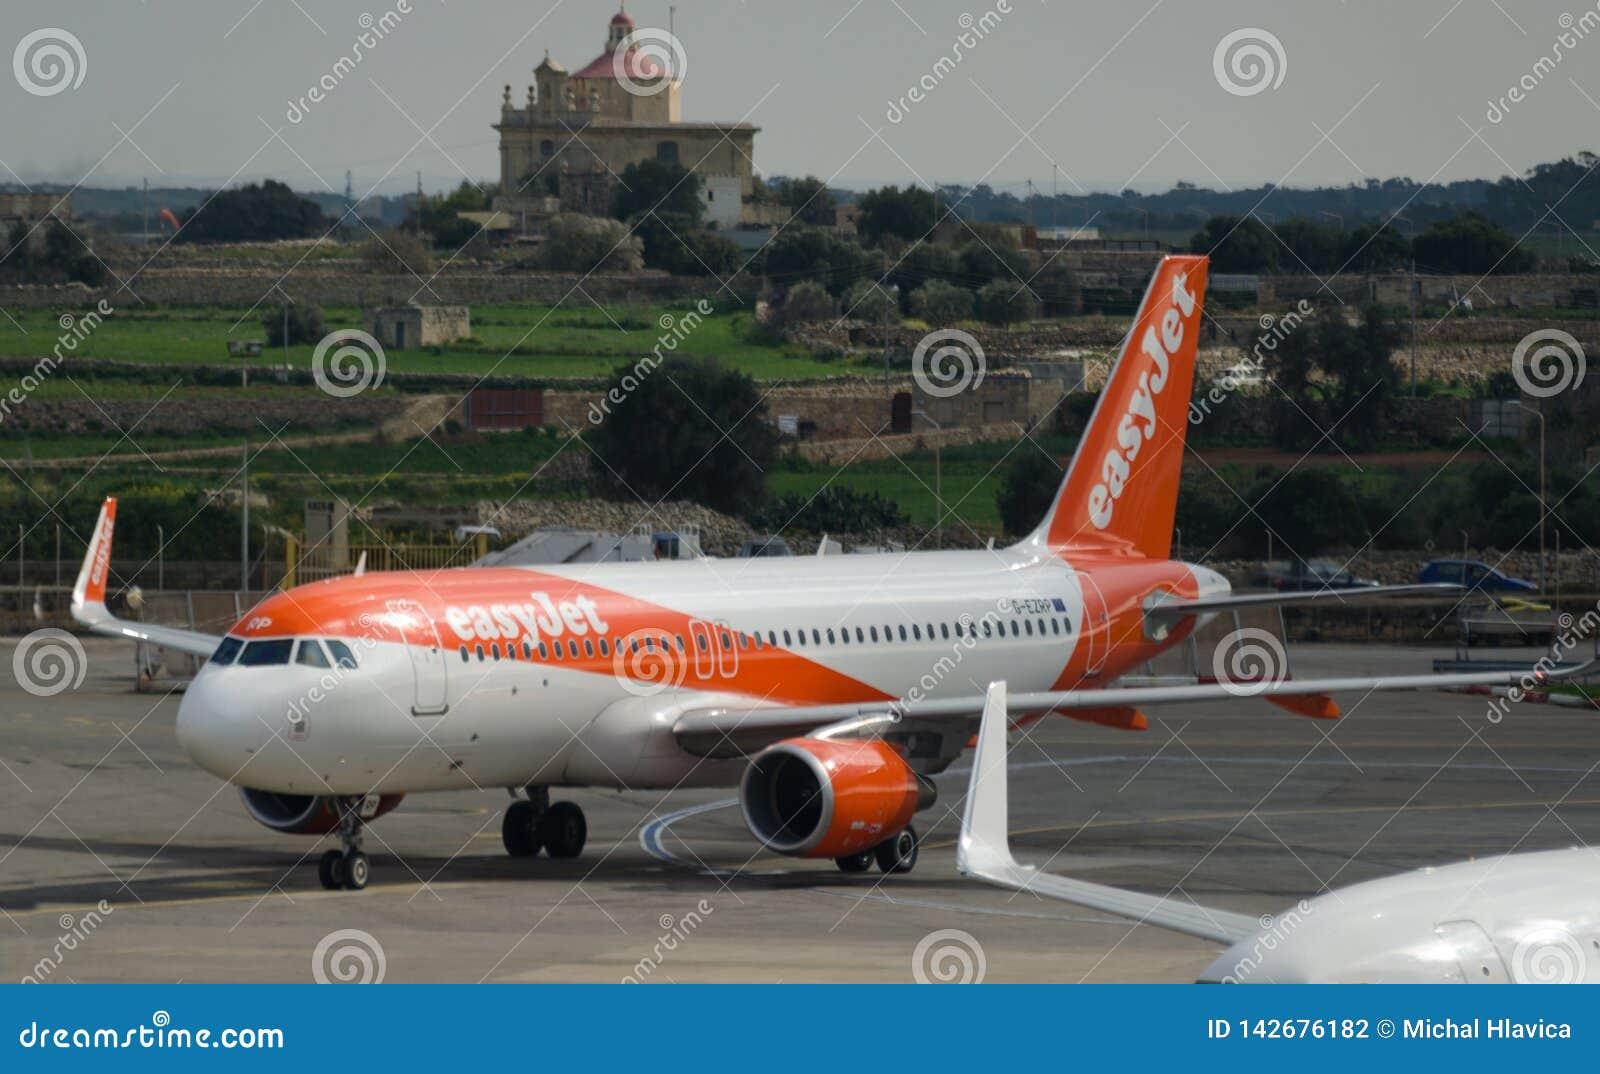 Baixo avião de passageiros custado jato fácil estacionado no aeroporto internacional de Malta